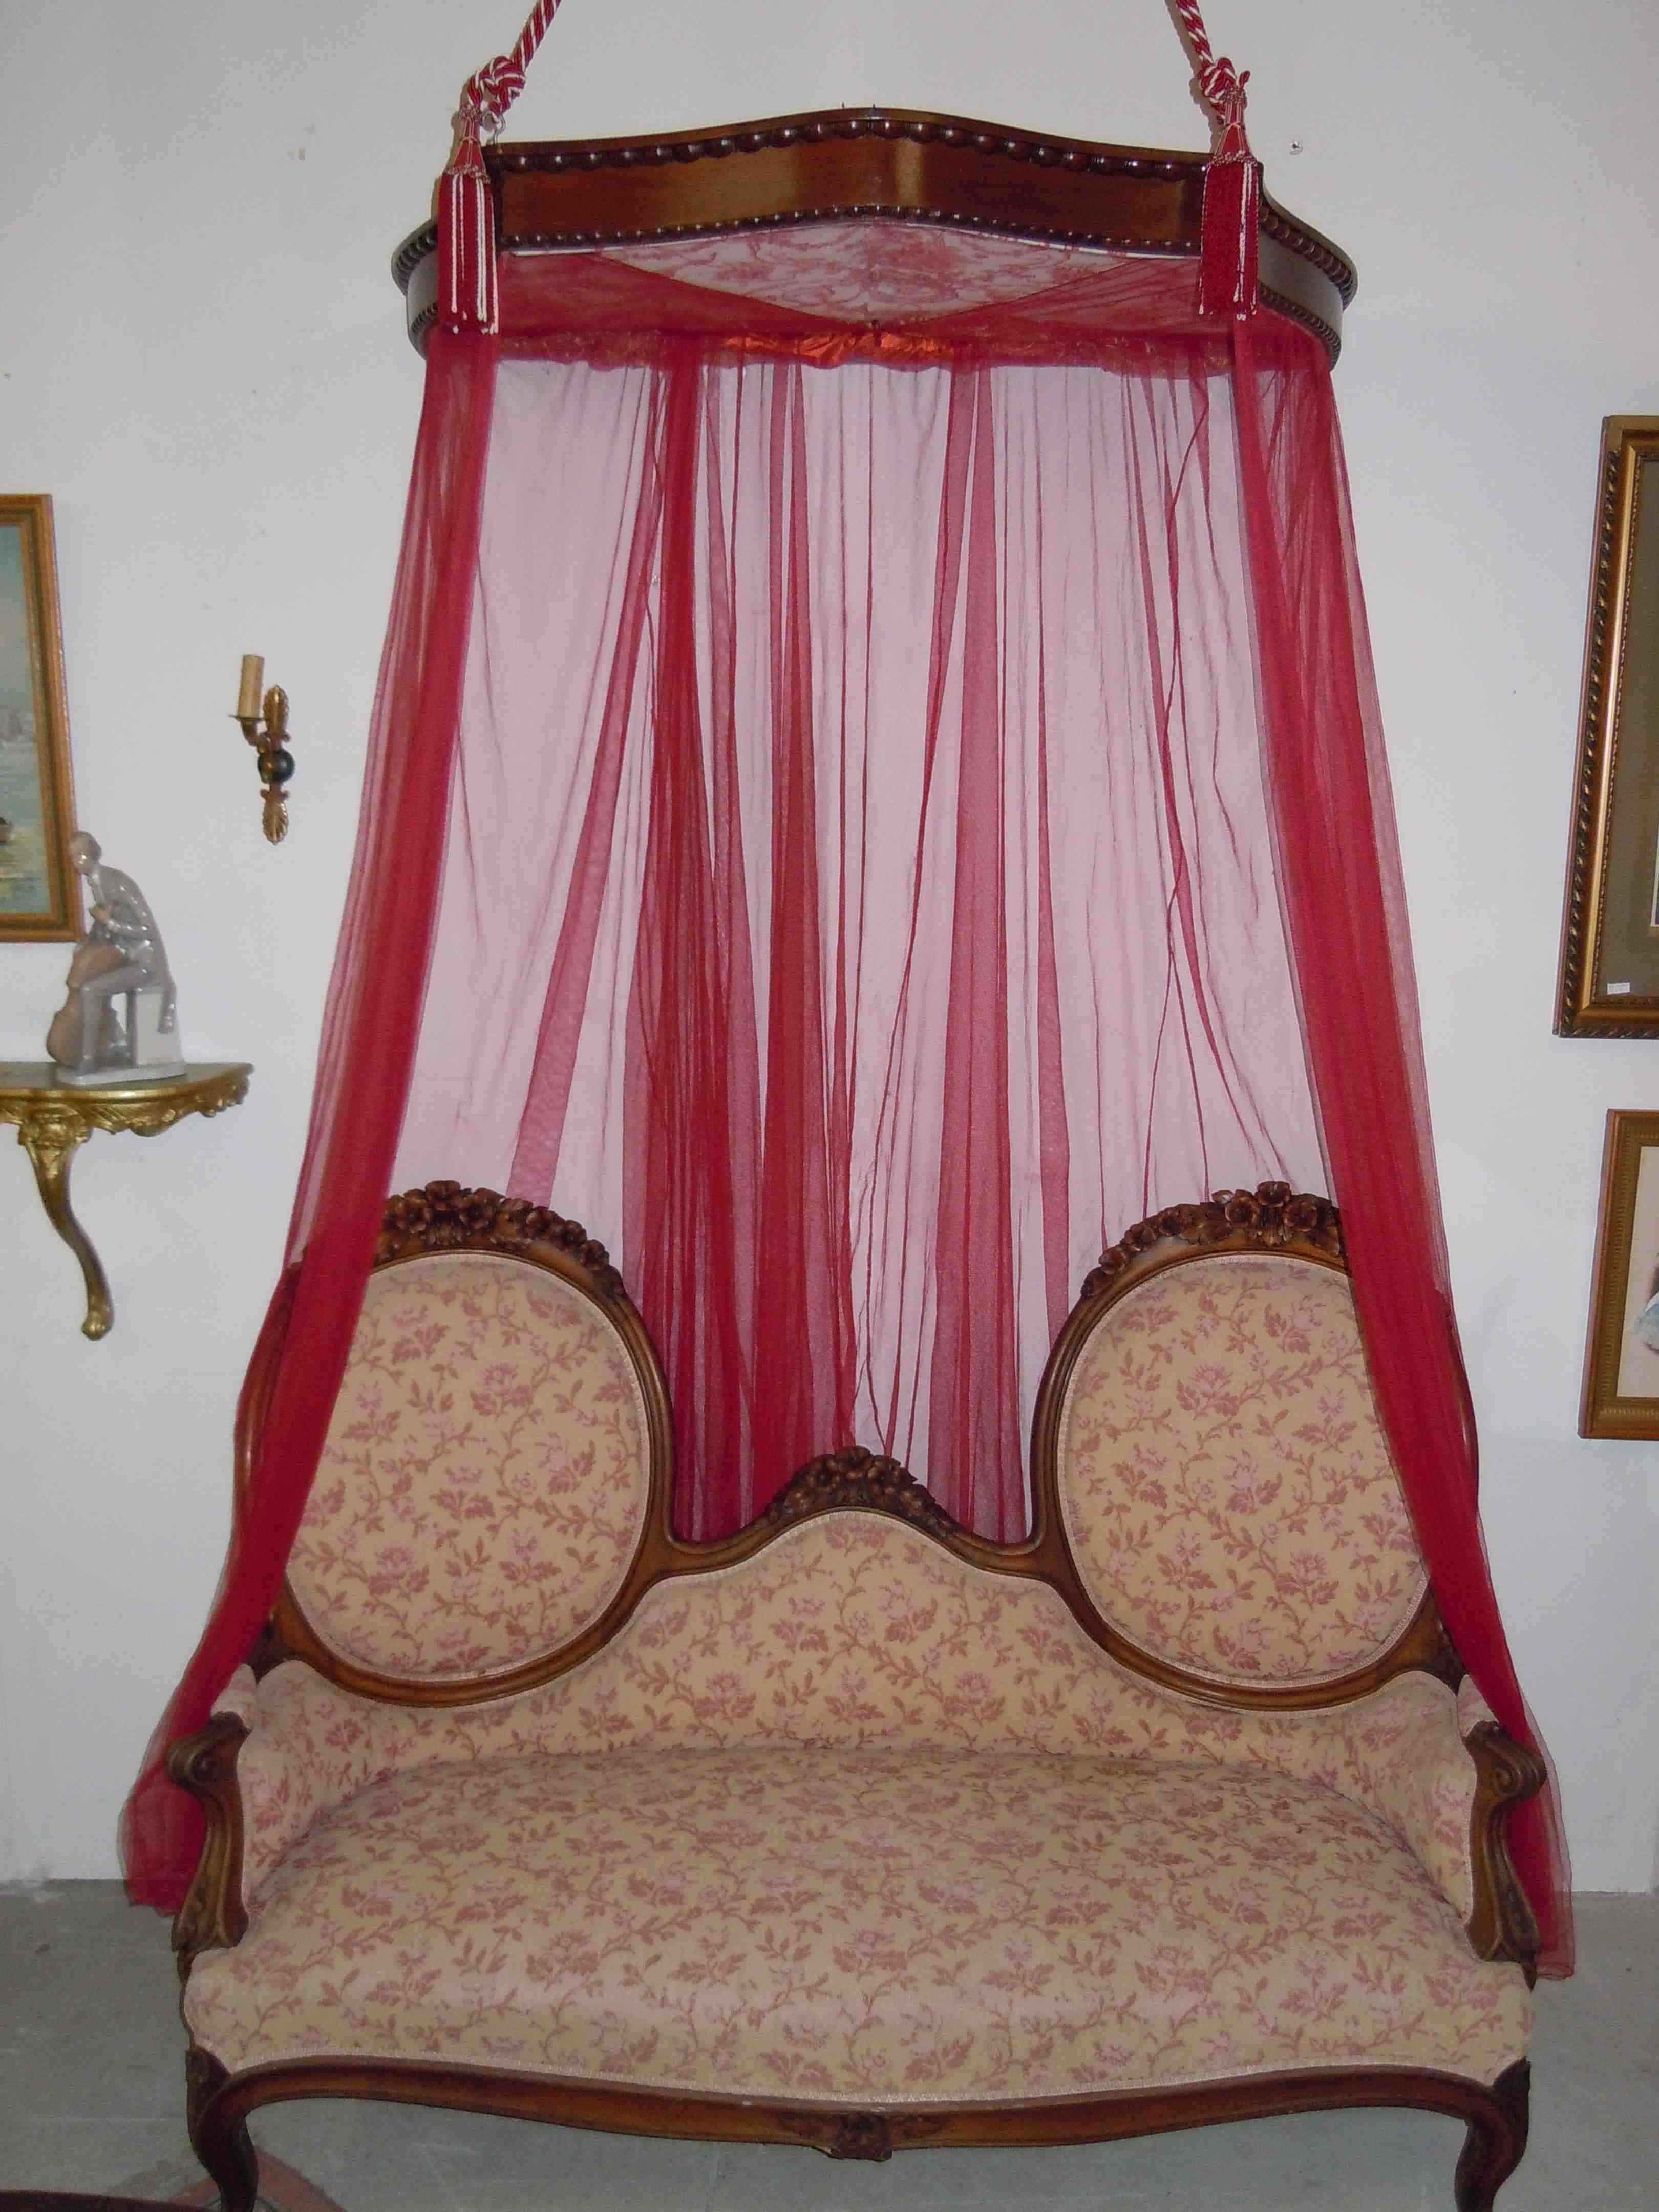 letto a baldacchino xix secolo anticswiss. Black Bedroom Furniture Sets. Home Design Ideas